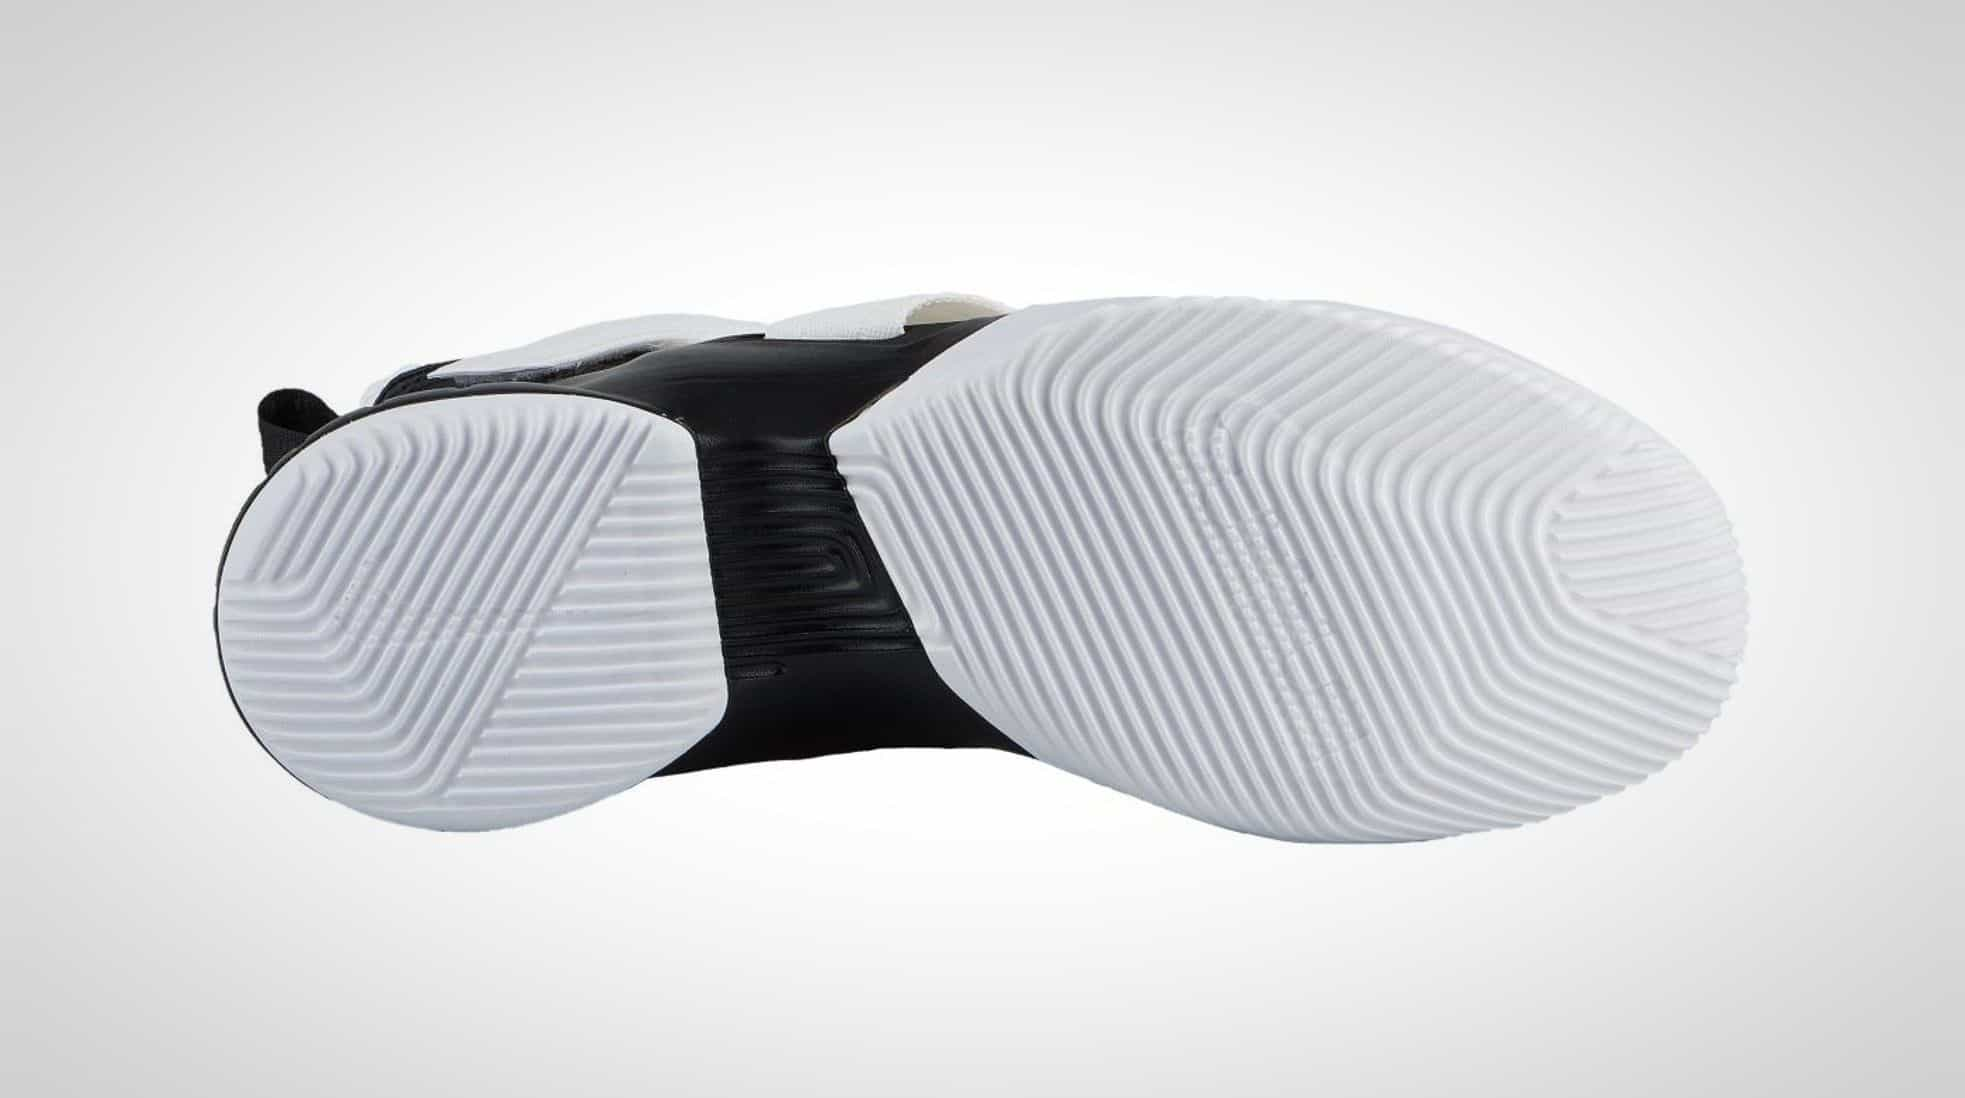 042dbe1575ee Nike Lebron Soldier 12 Shoe Review - BestOutdoorBasketball